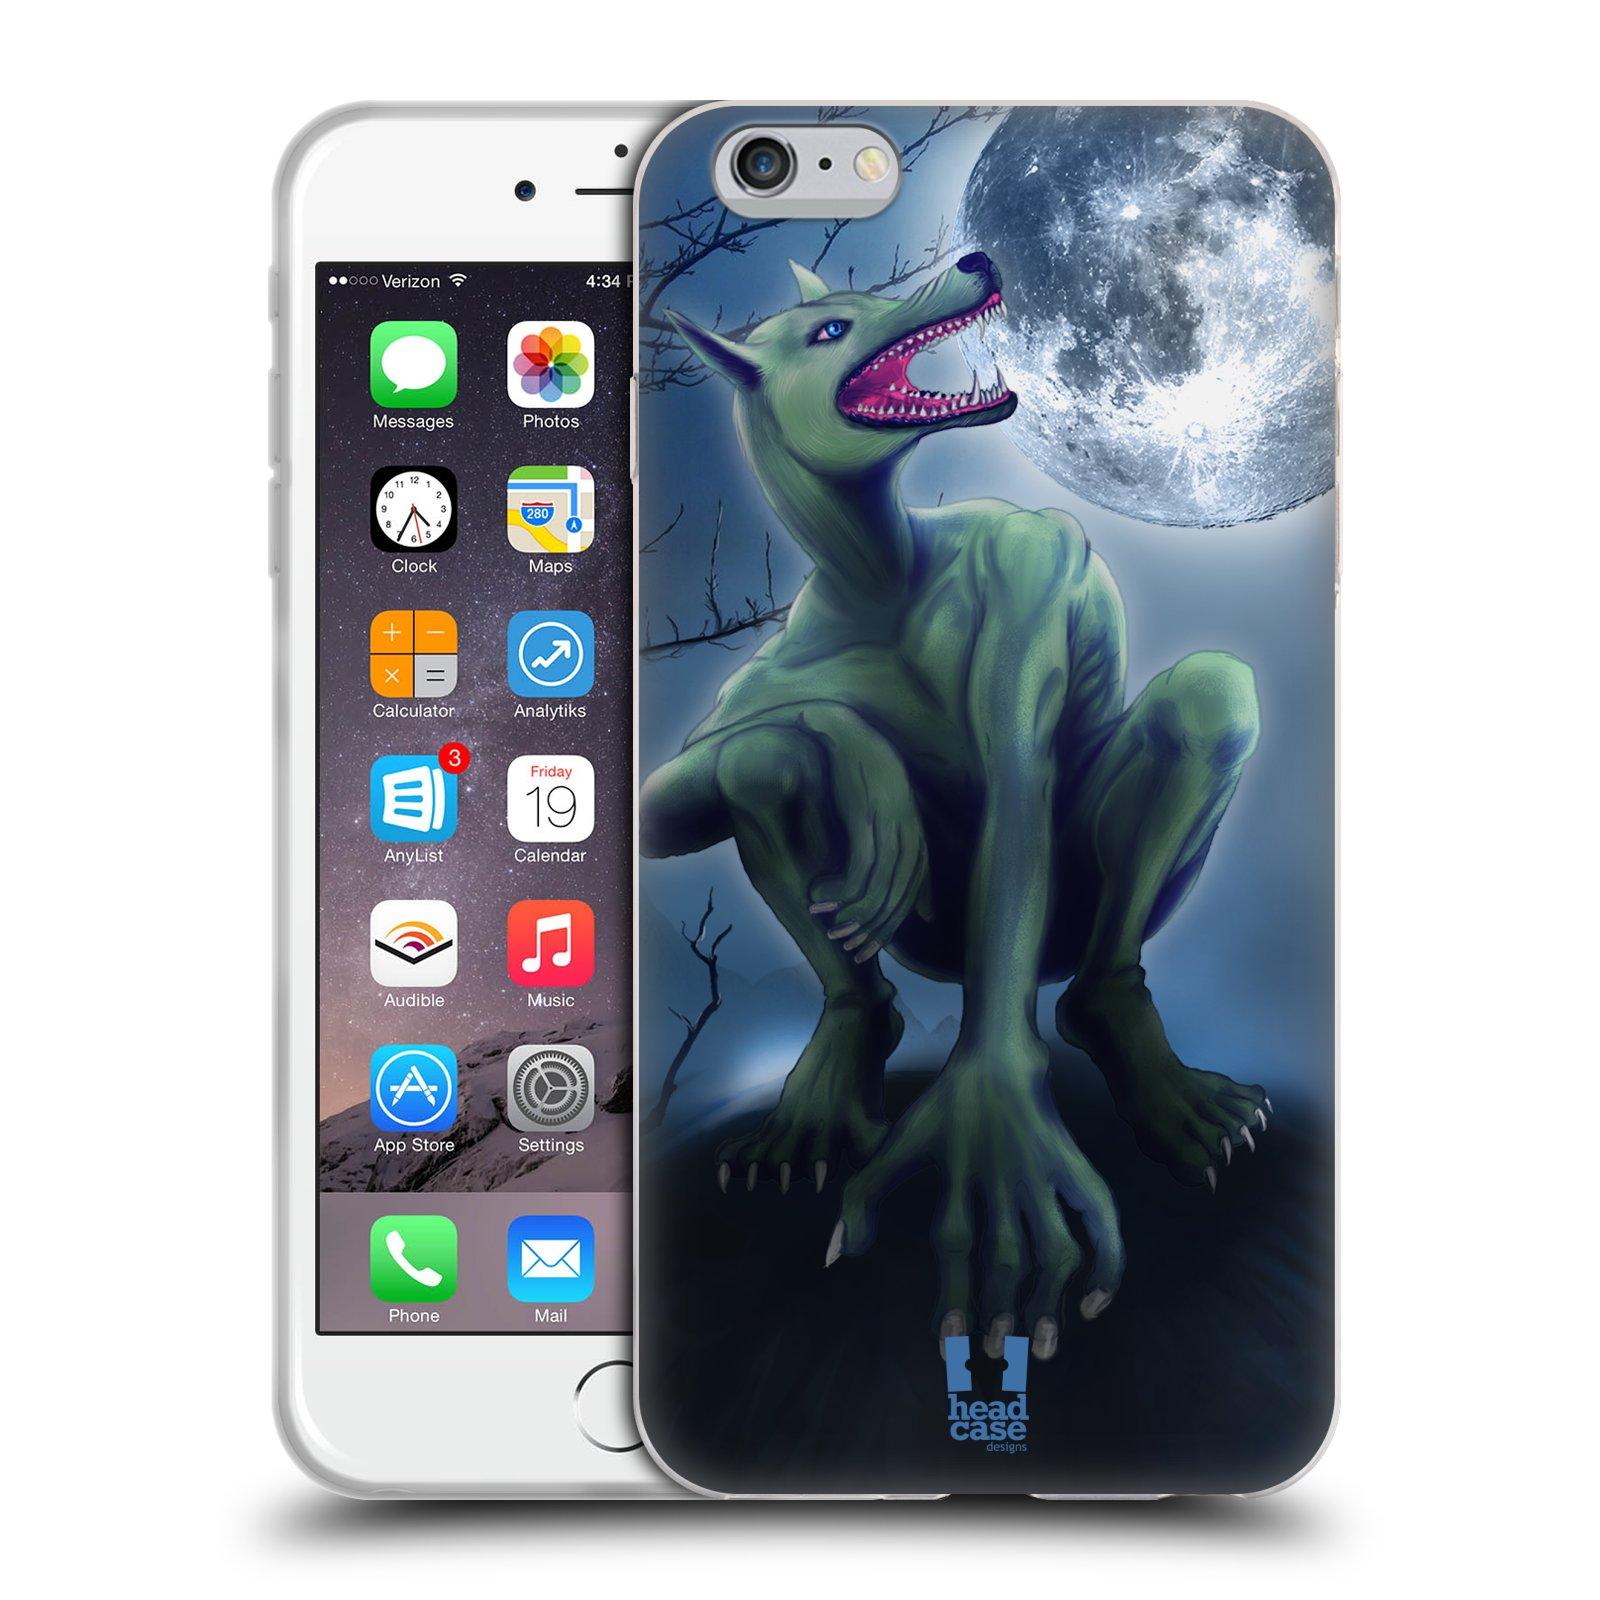 HEAD CASE silikonový obal na mobil Apple Iphone 6 PLUS/ 6S PLUS vzor Pohádkové příšery VLKODLAK